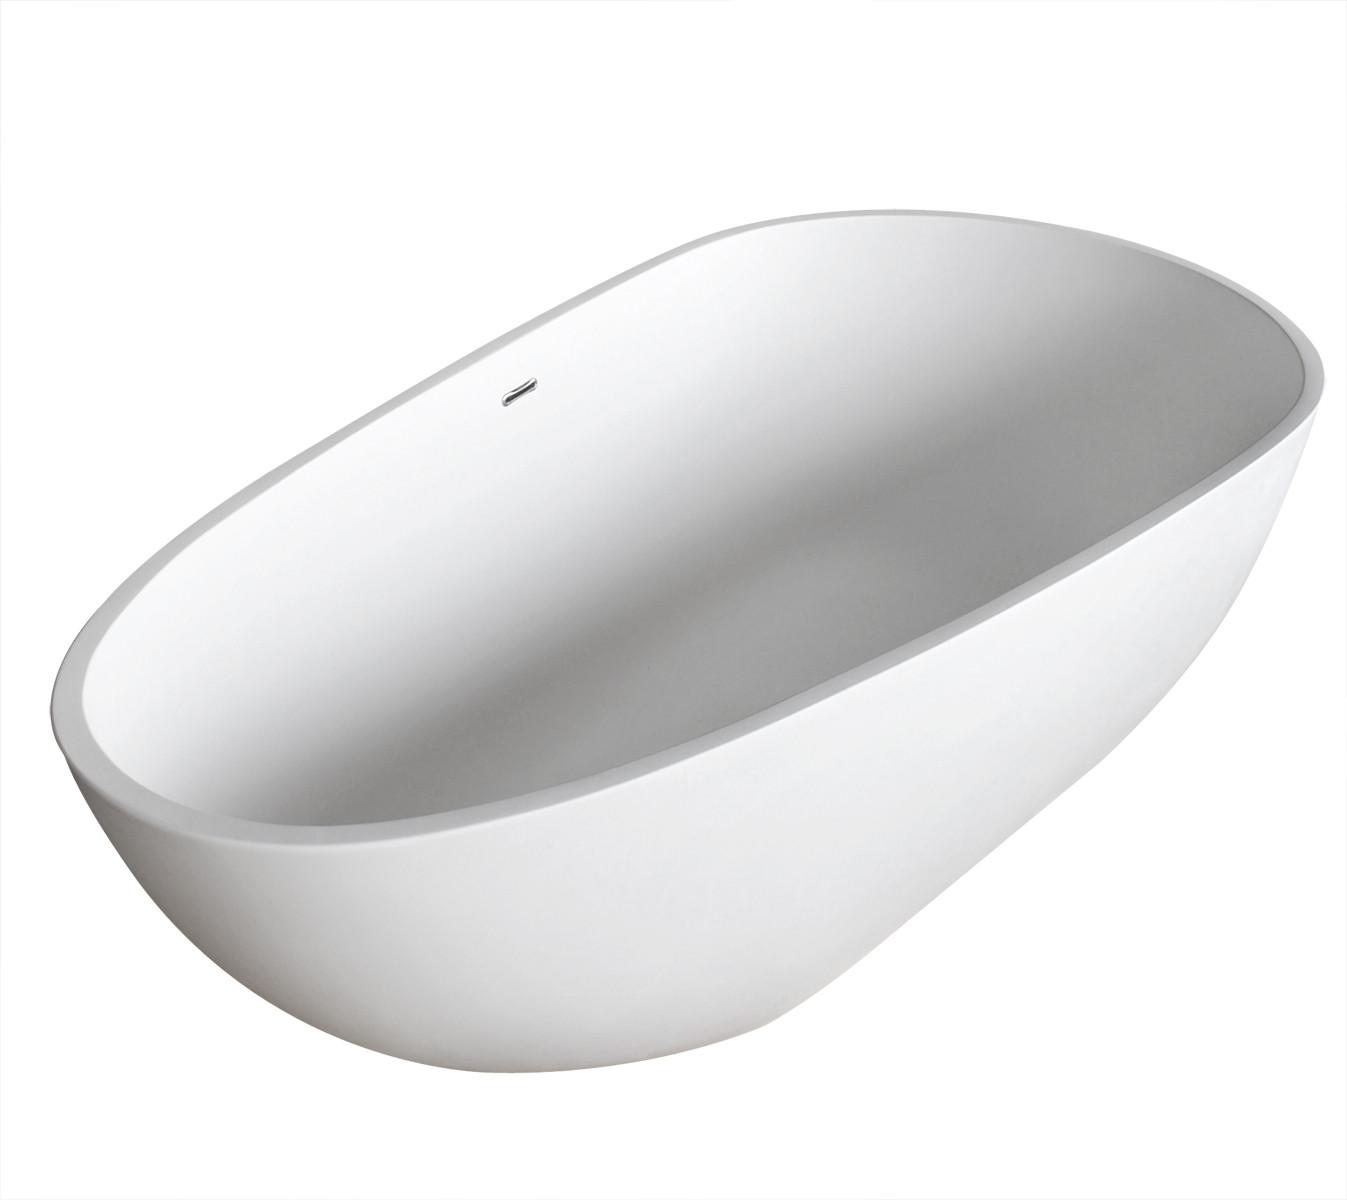 Fiume Man-Made Stone Freestanding Bathtub in Matte White